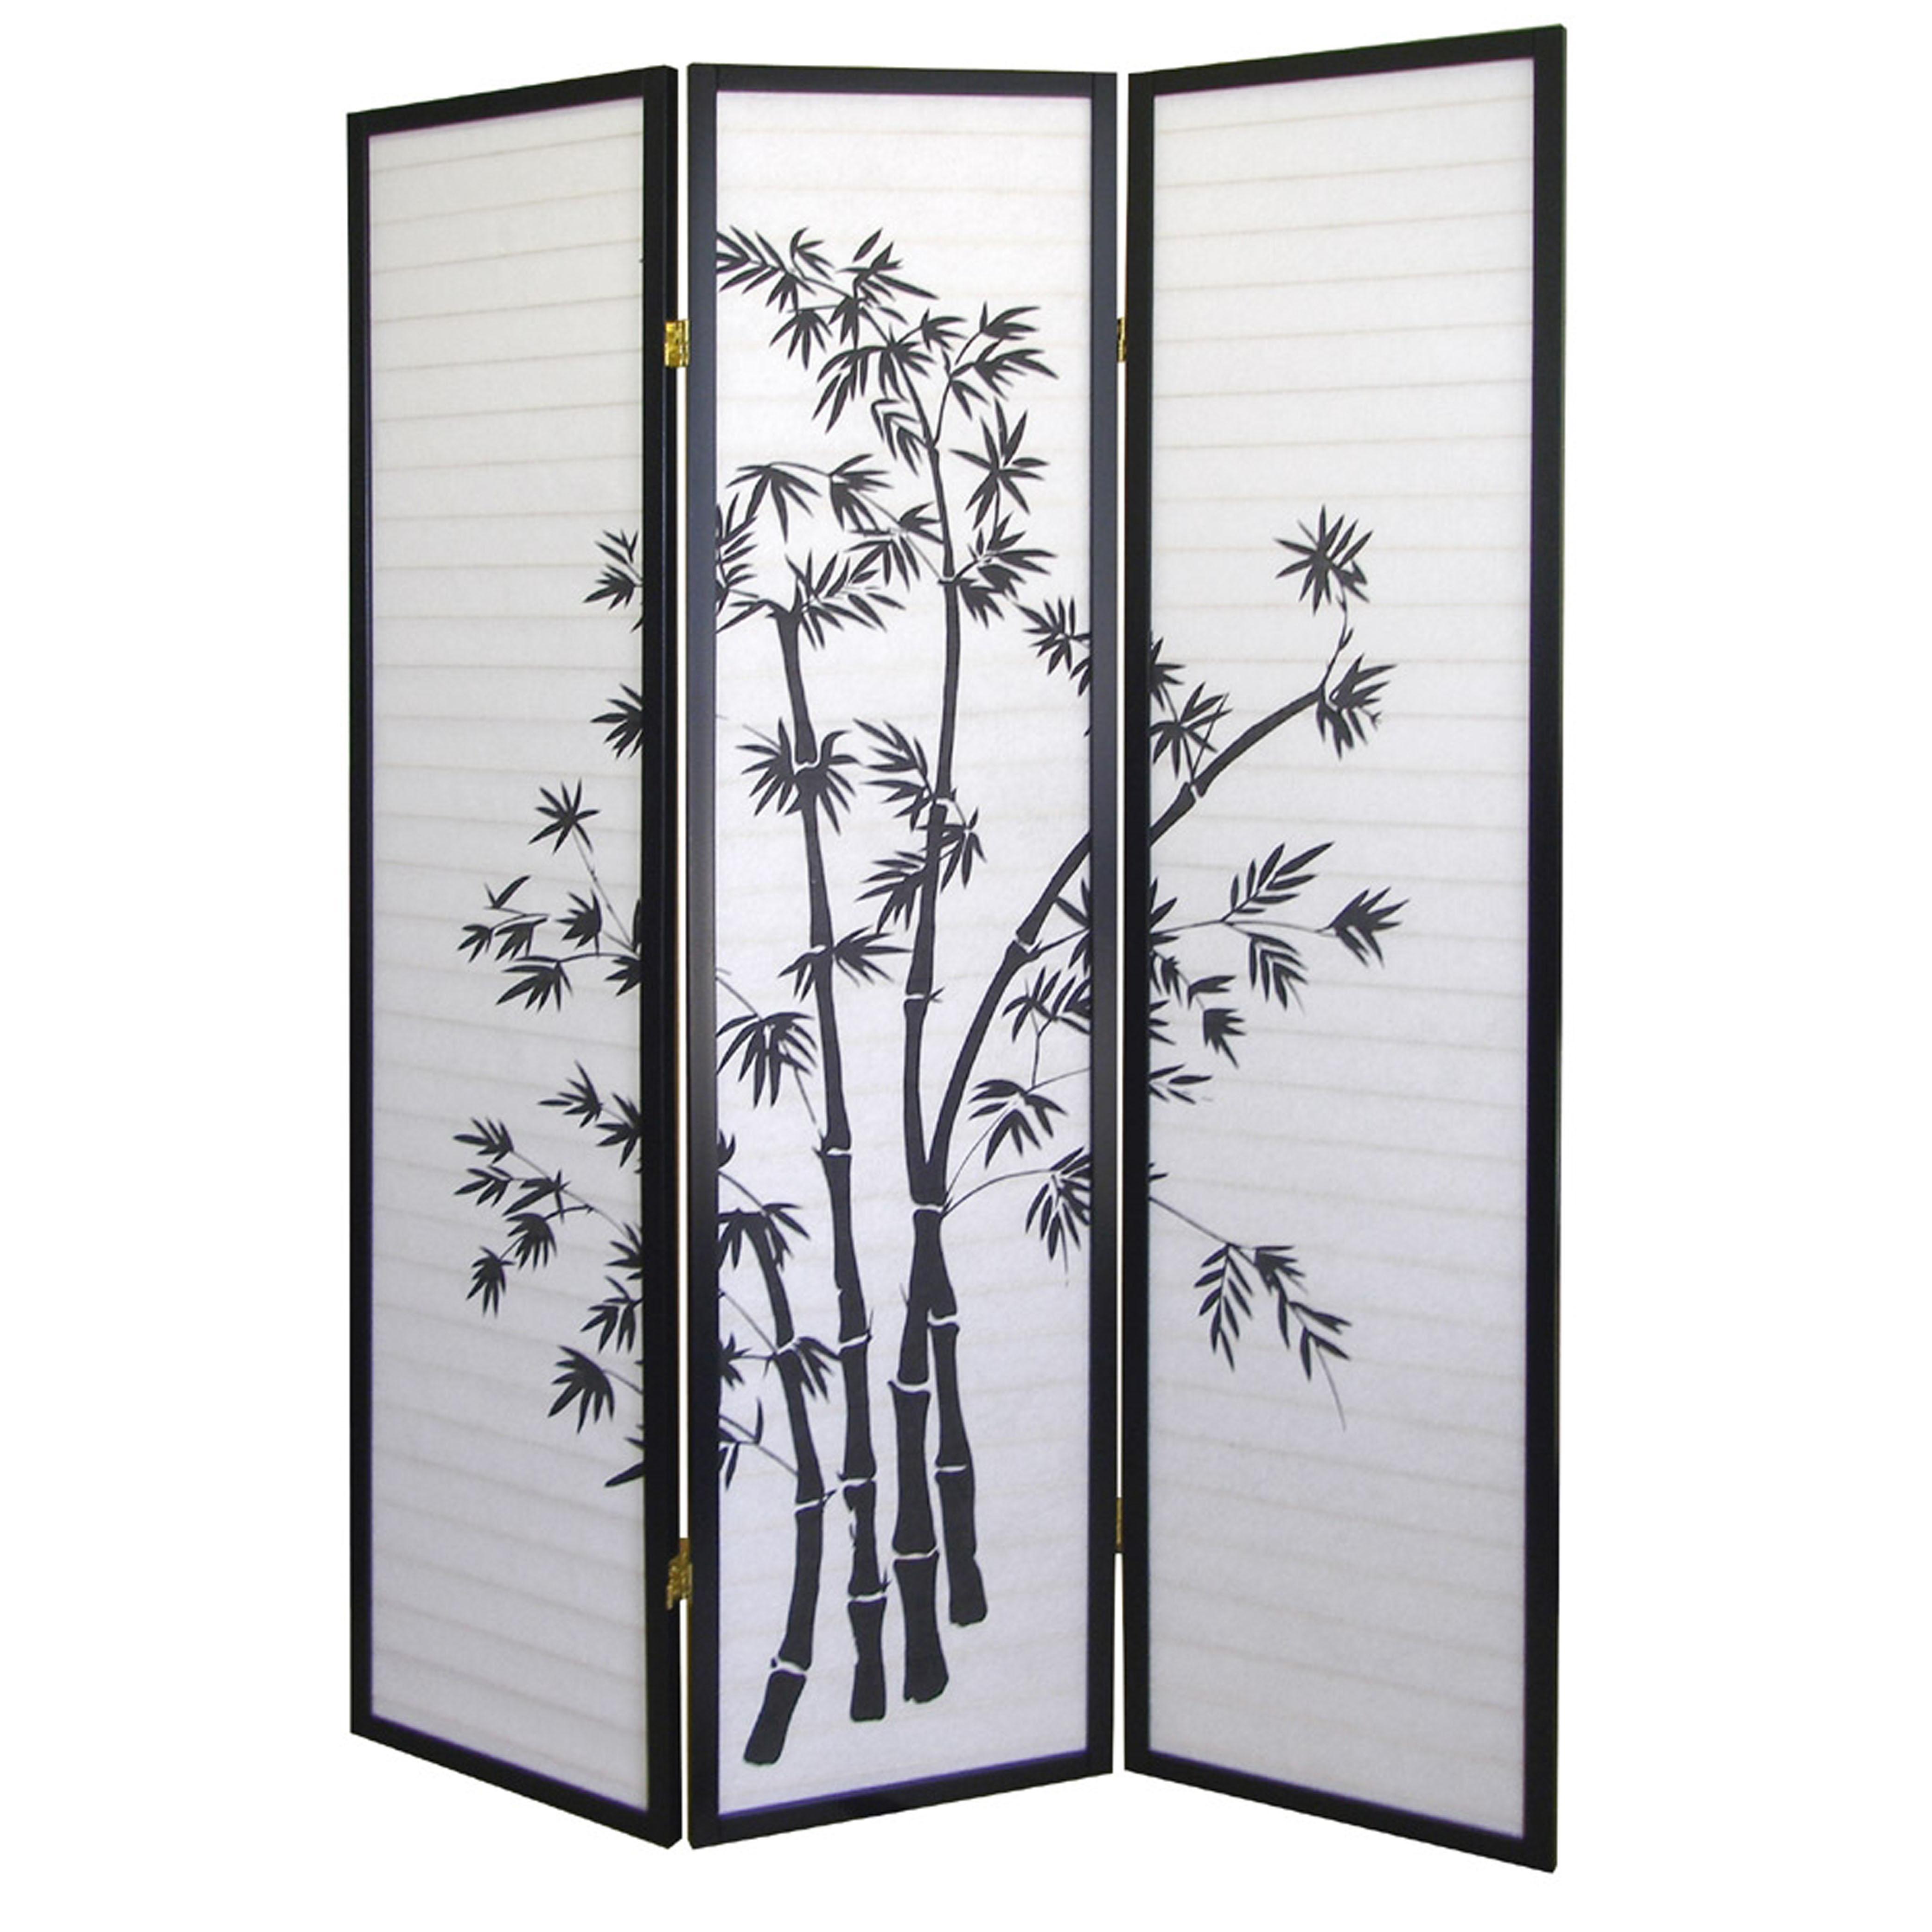 Ore international bamboo 3 panel room divider by oj commerce r591 - 3 panel screen room divider ...